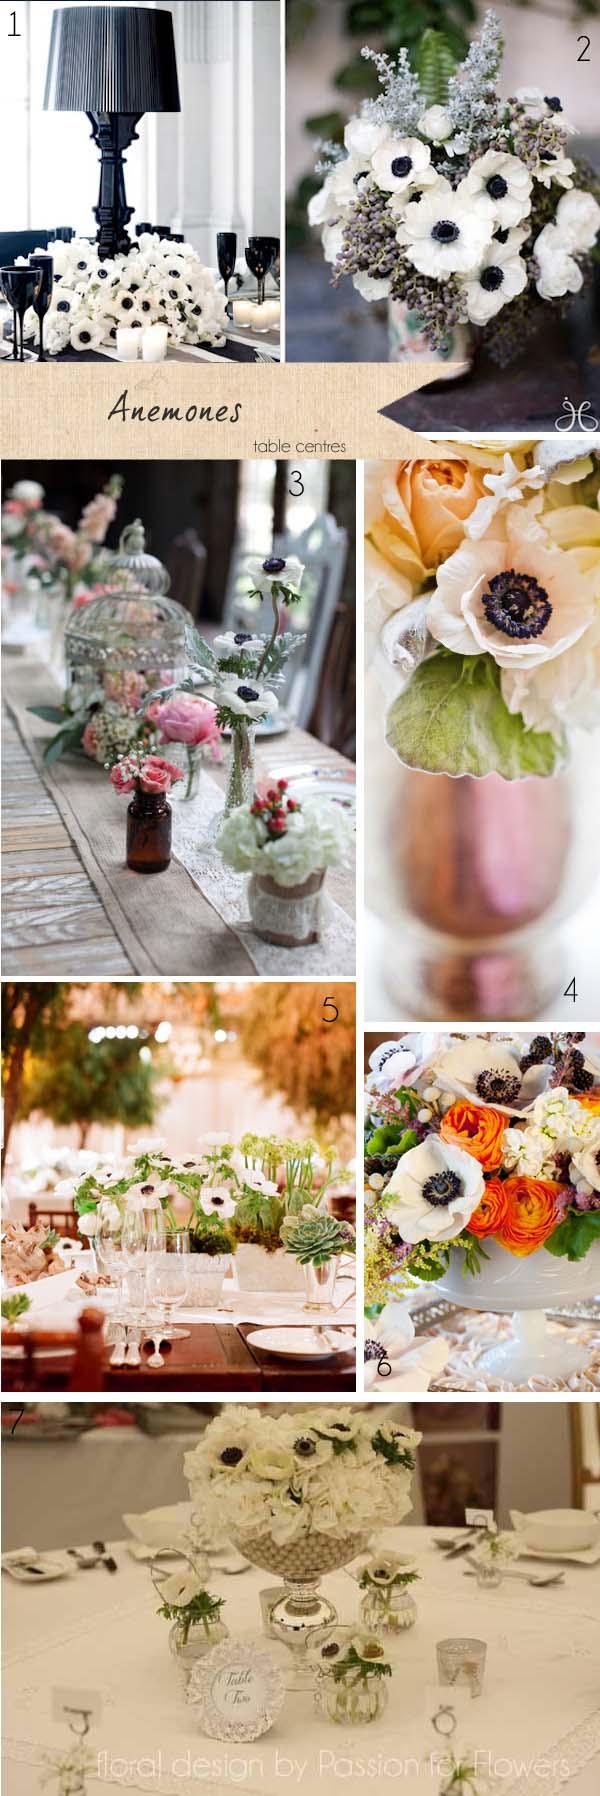 anemone wedding table centres wedding flowers